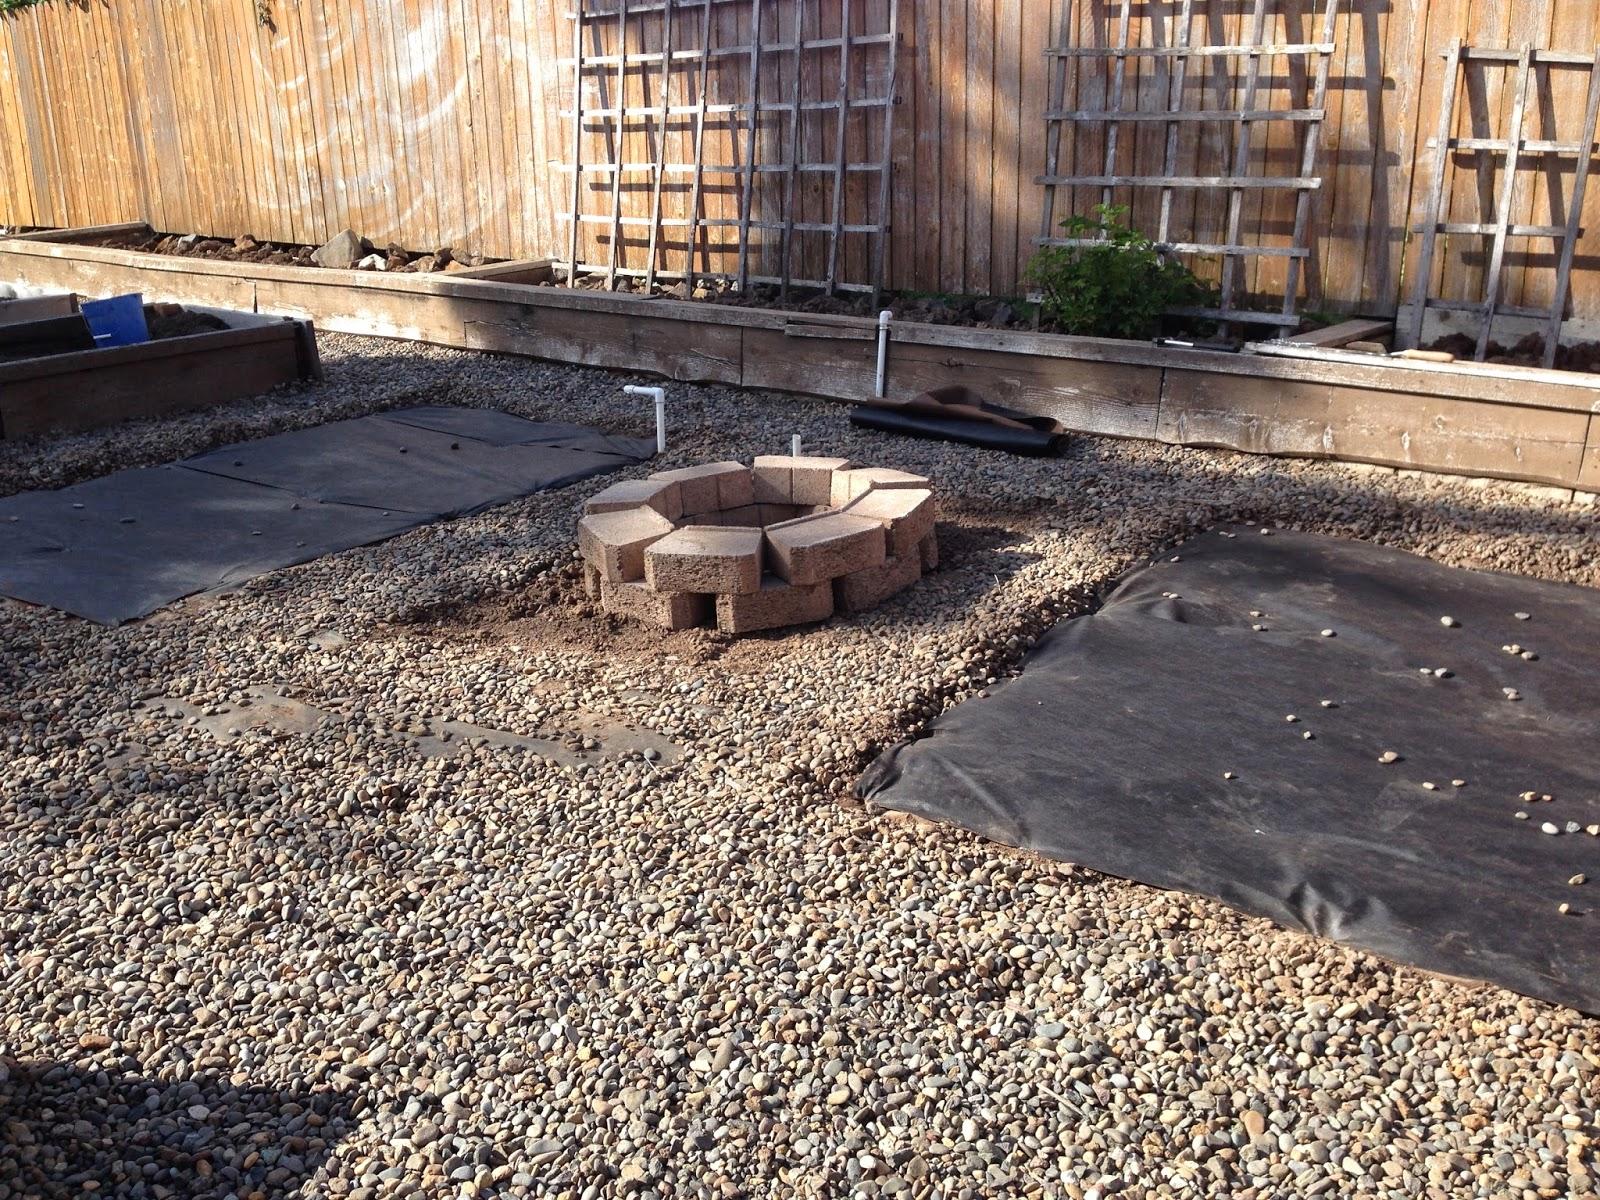 The Grimmett's: Errands, Heat Wave, and Yard Work